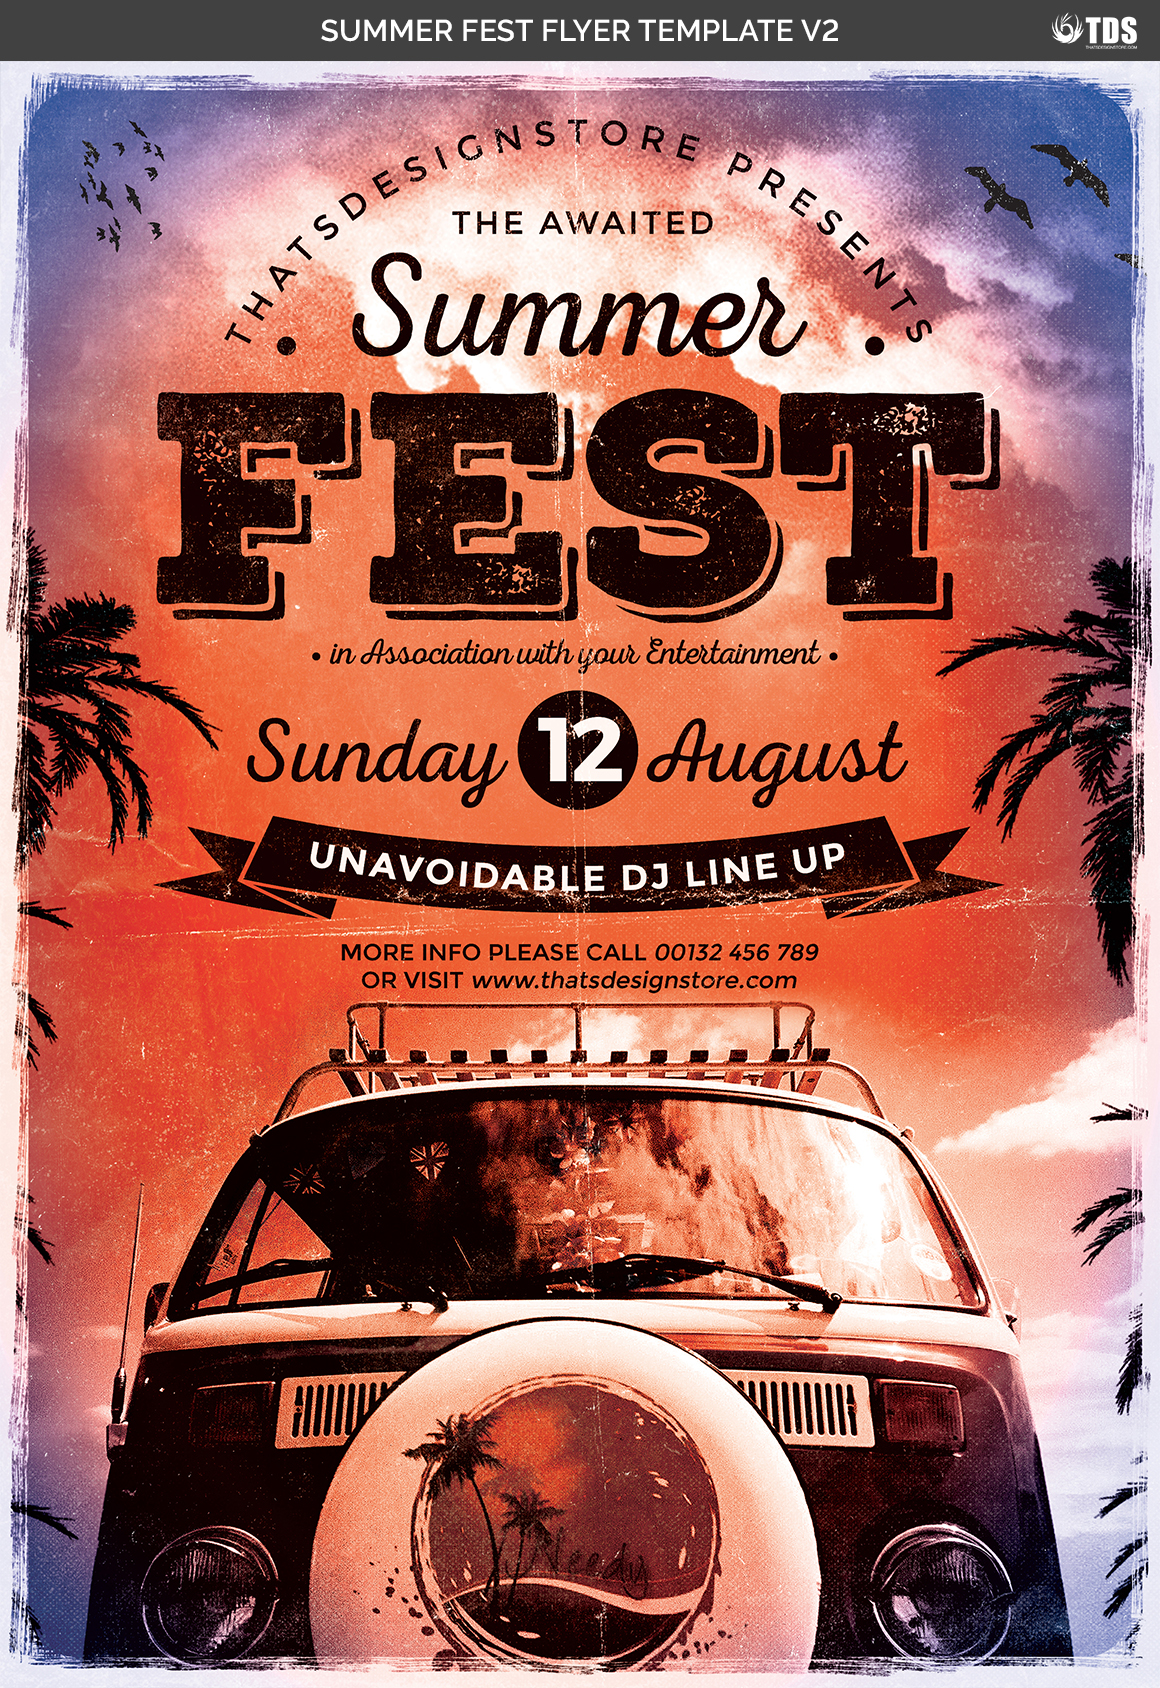 Summer Fest Flyer Template V2 example image 4